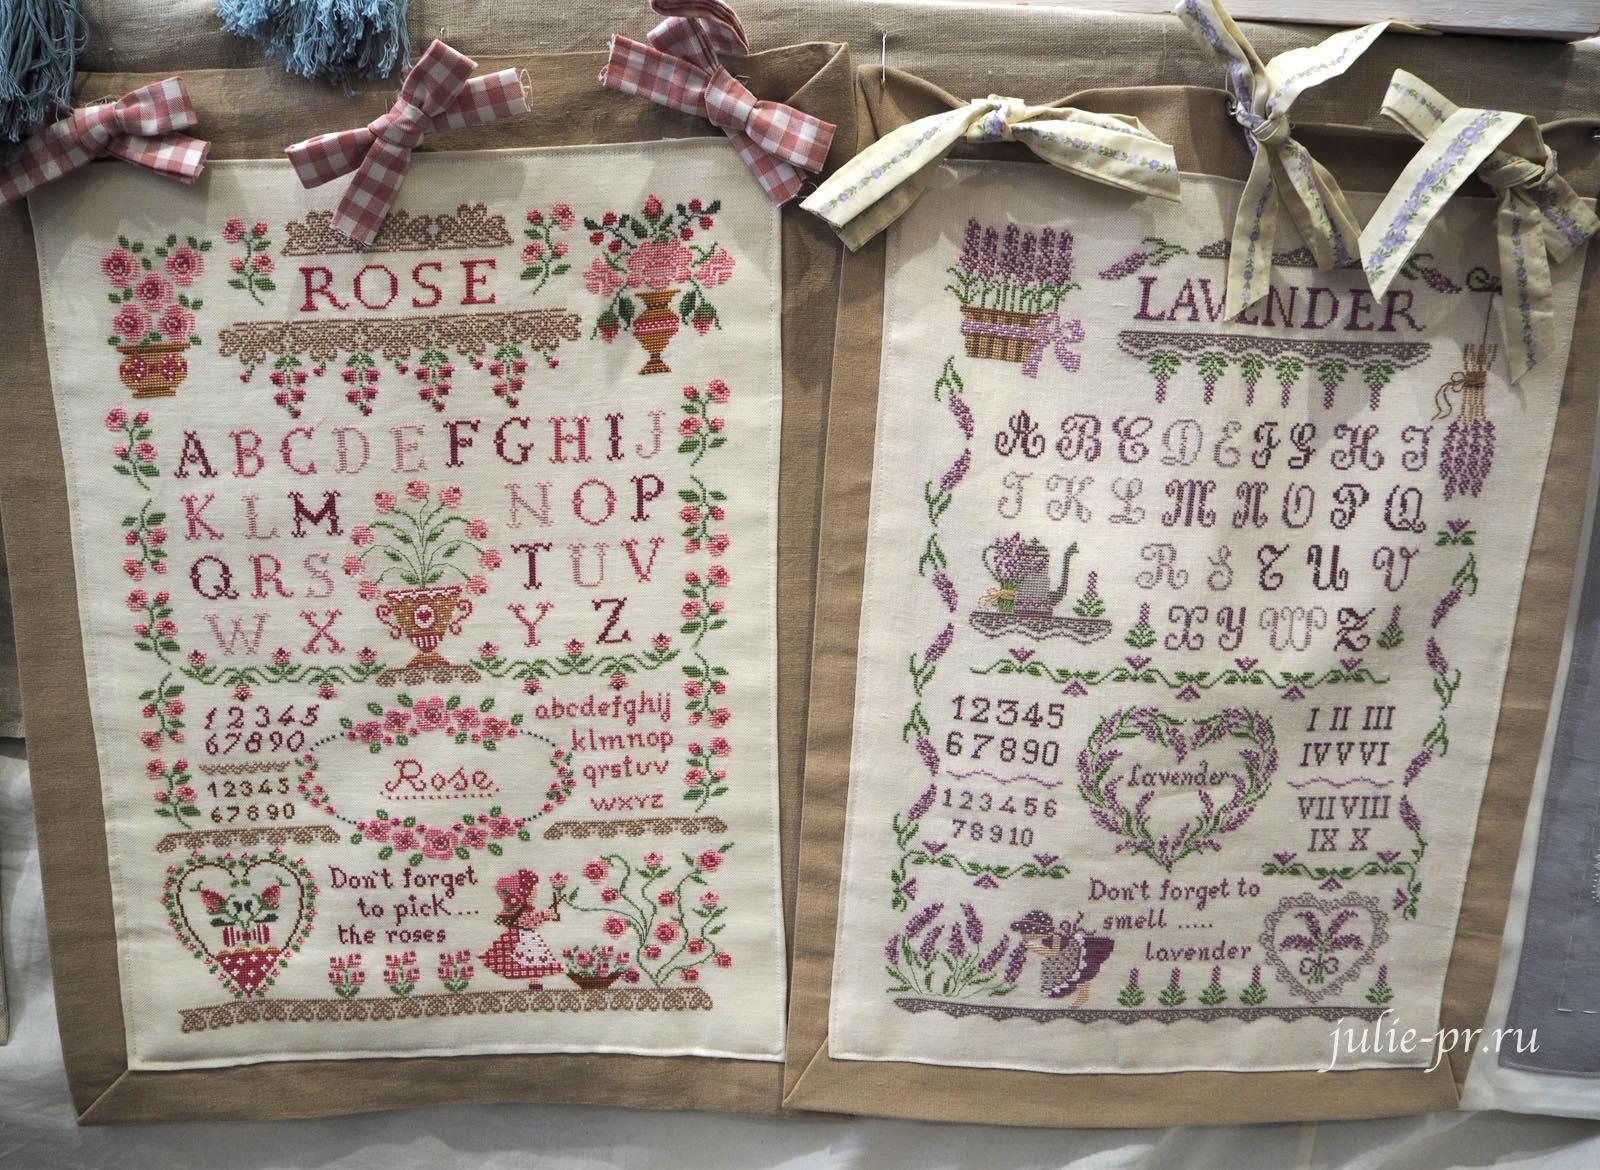 Cuore e batticuore, Rose Sampler, Lavender Sampler, Лавандовый семплер, розовый семплер, вышивка крестом